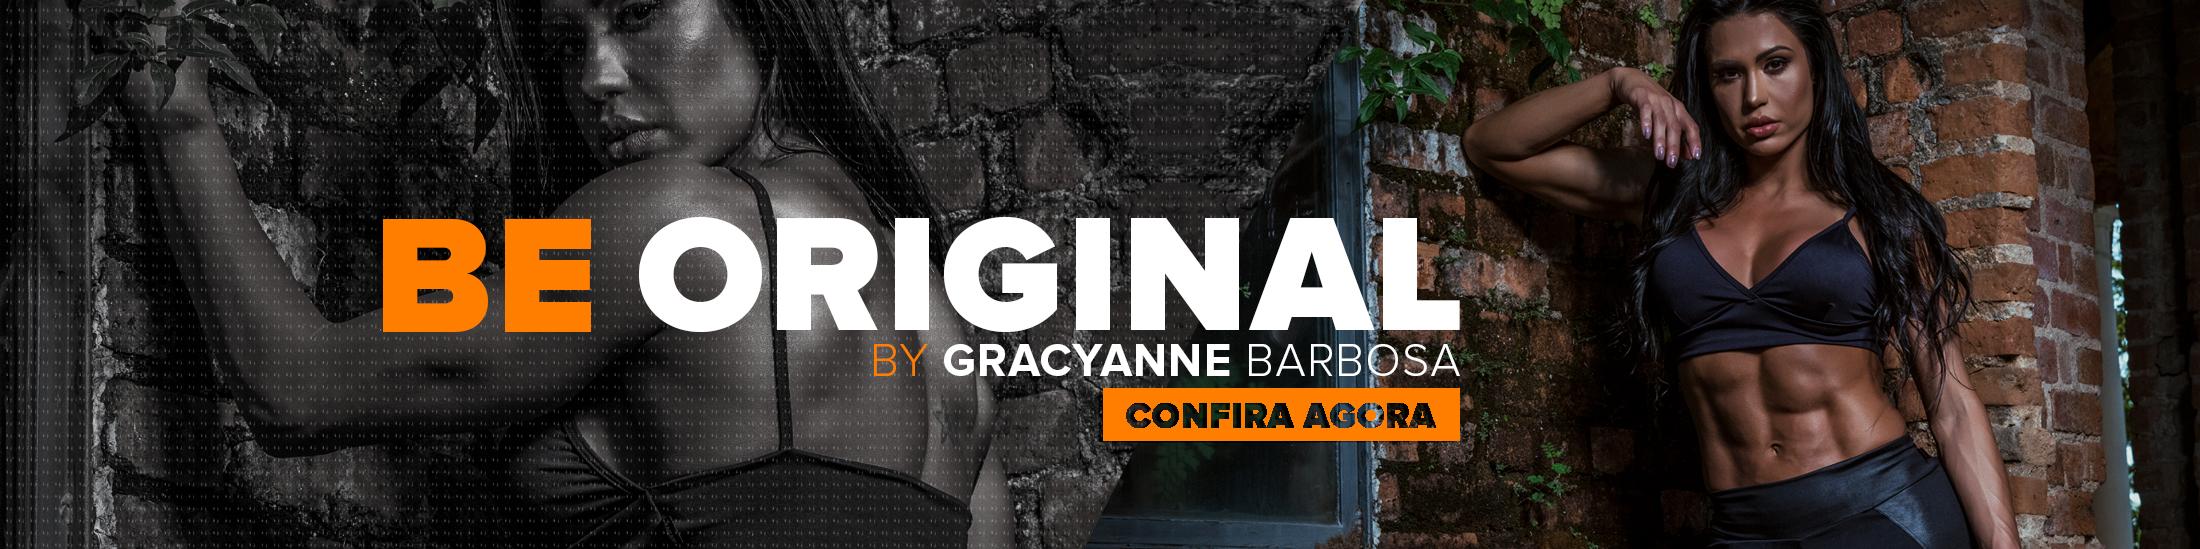 Coleç~ao Gracyanne Barbosa